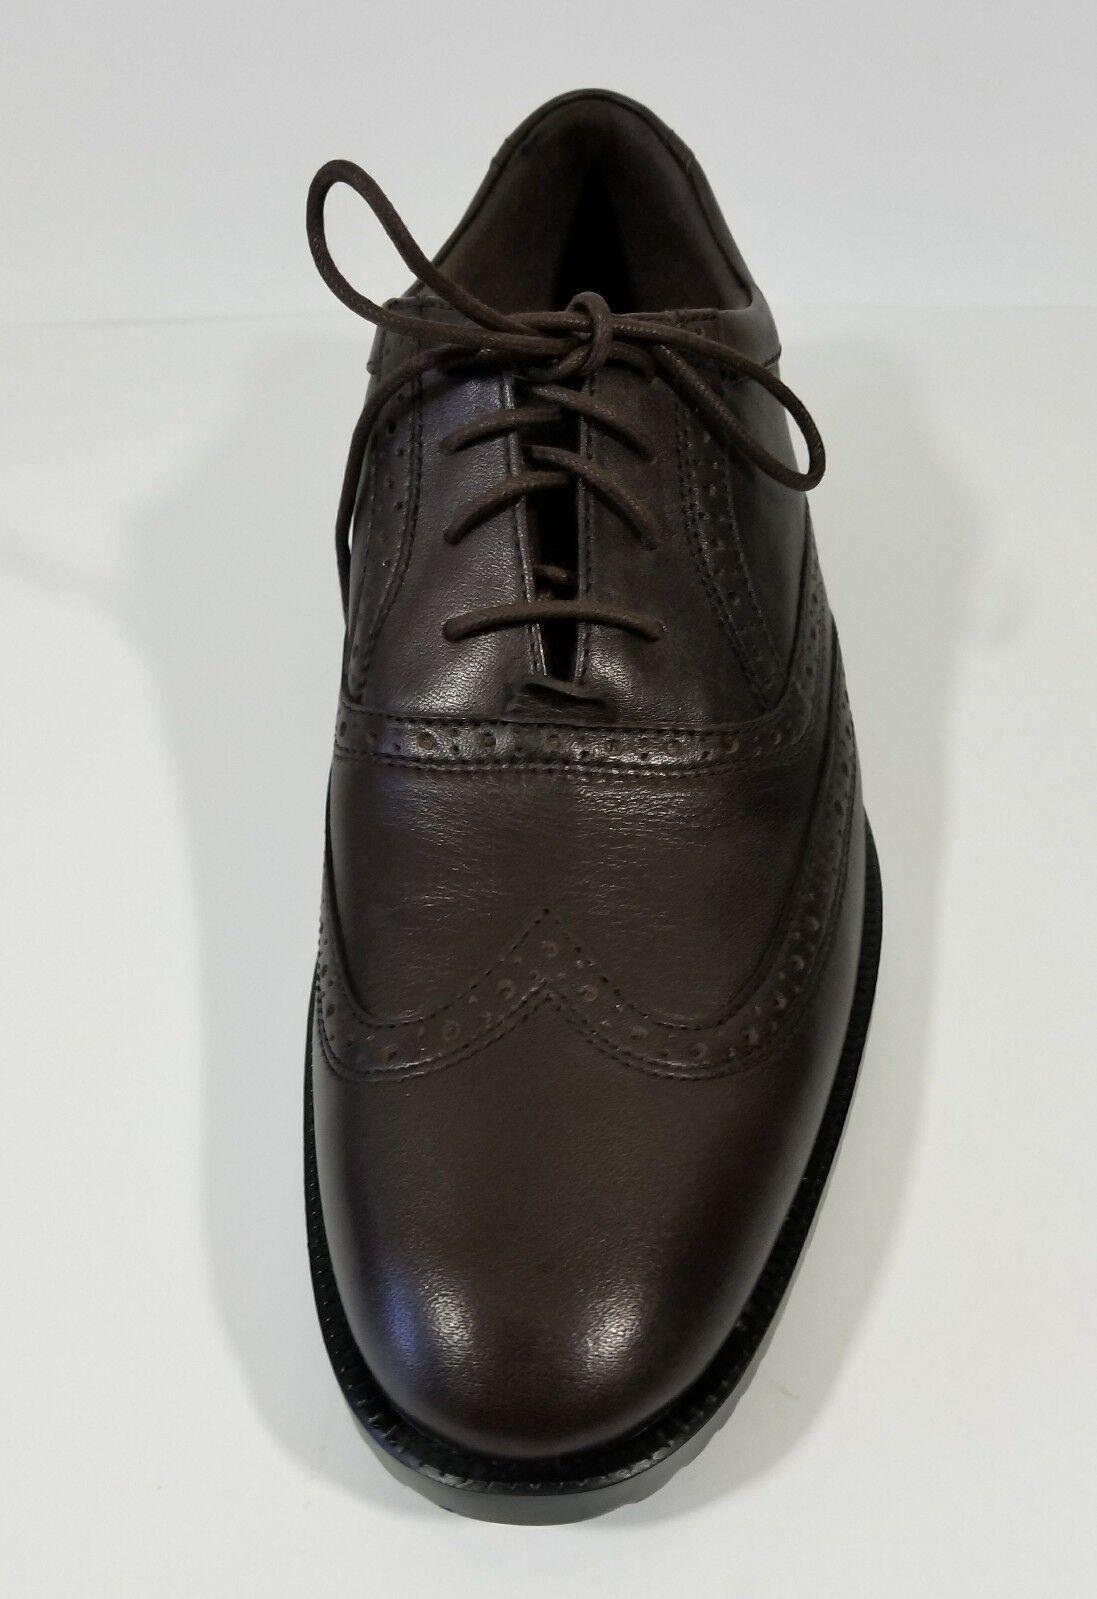 Rockport Darrick Mens Tip Dress Shoes Brown Wing Tip Mens Size 10.5 Leather 155ffb